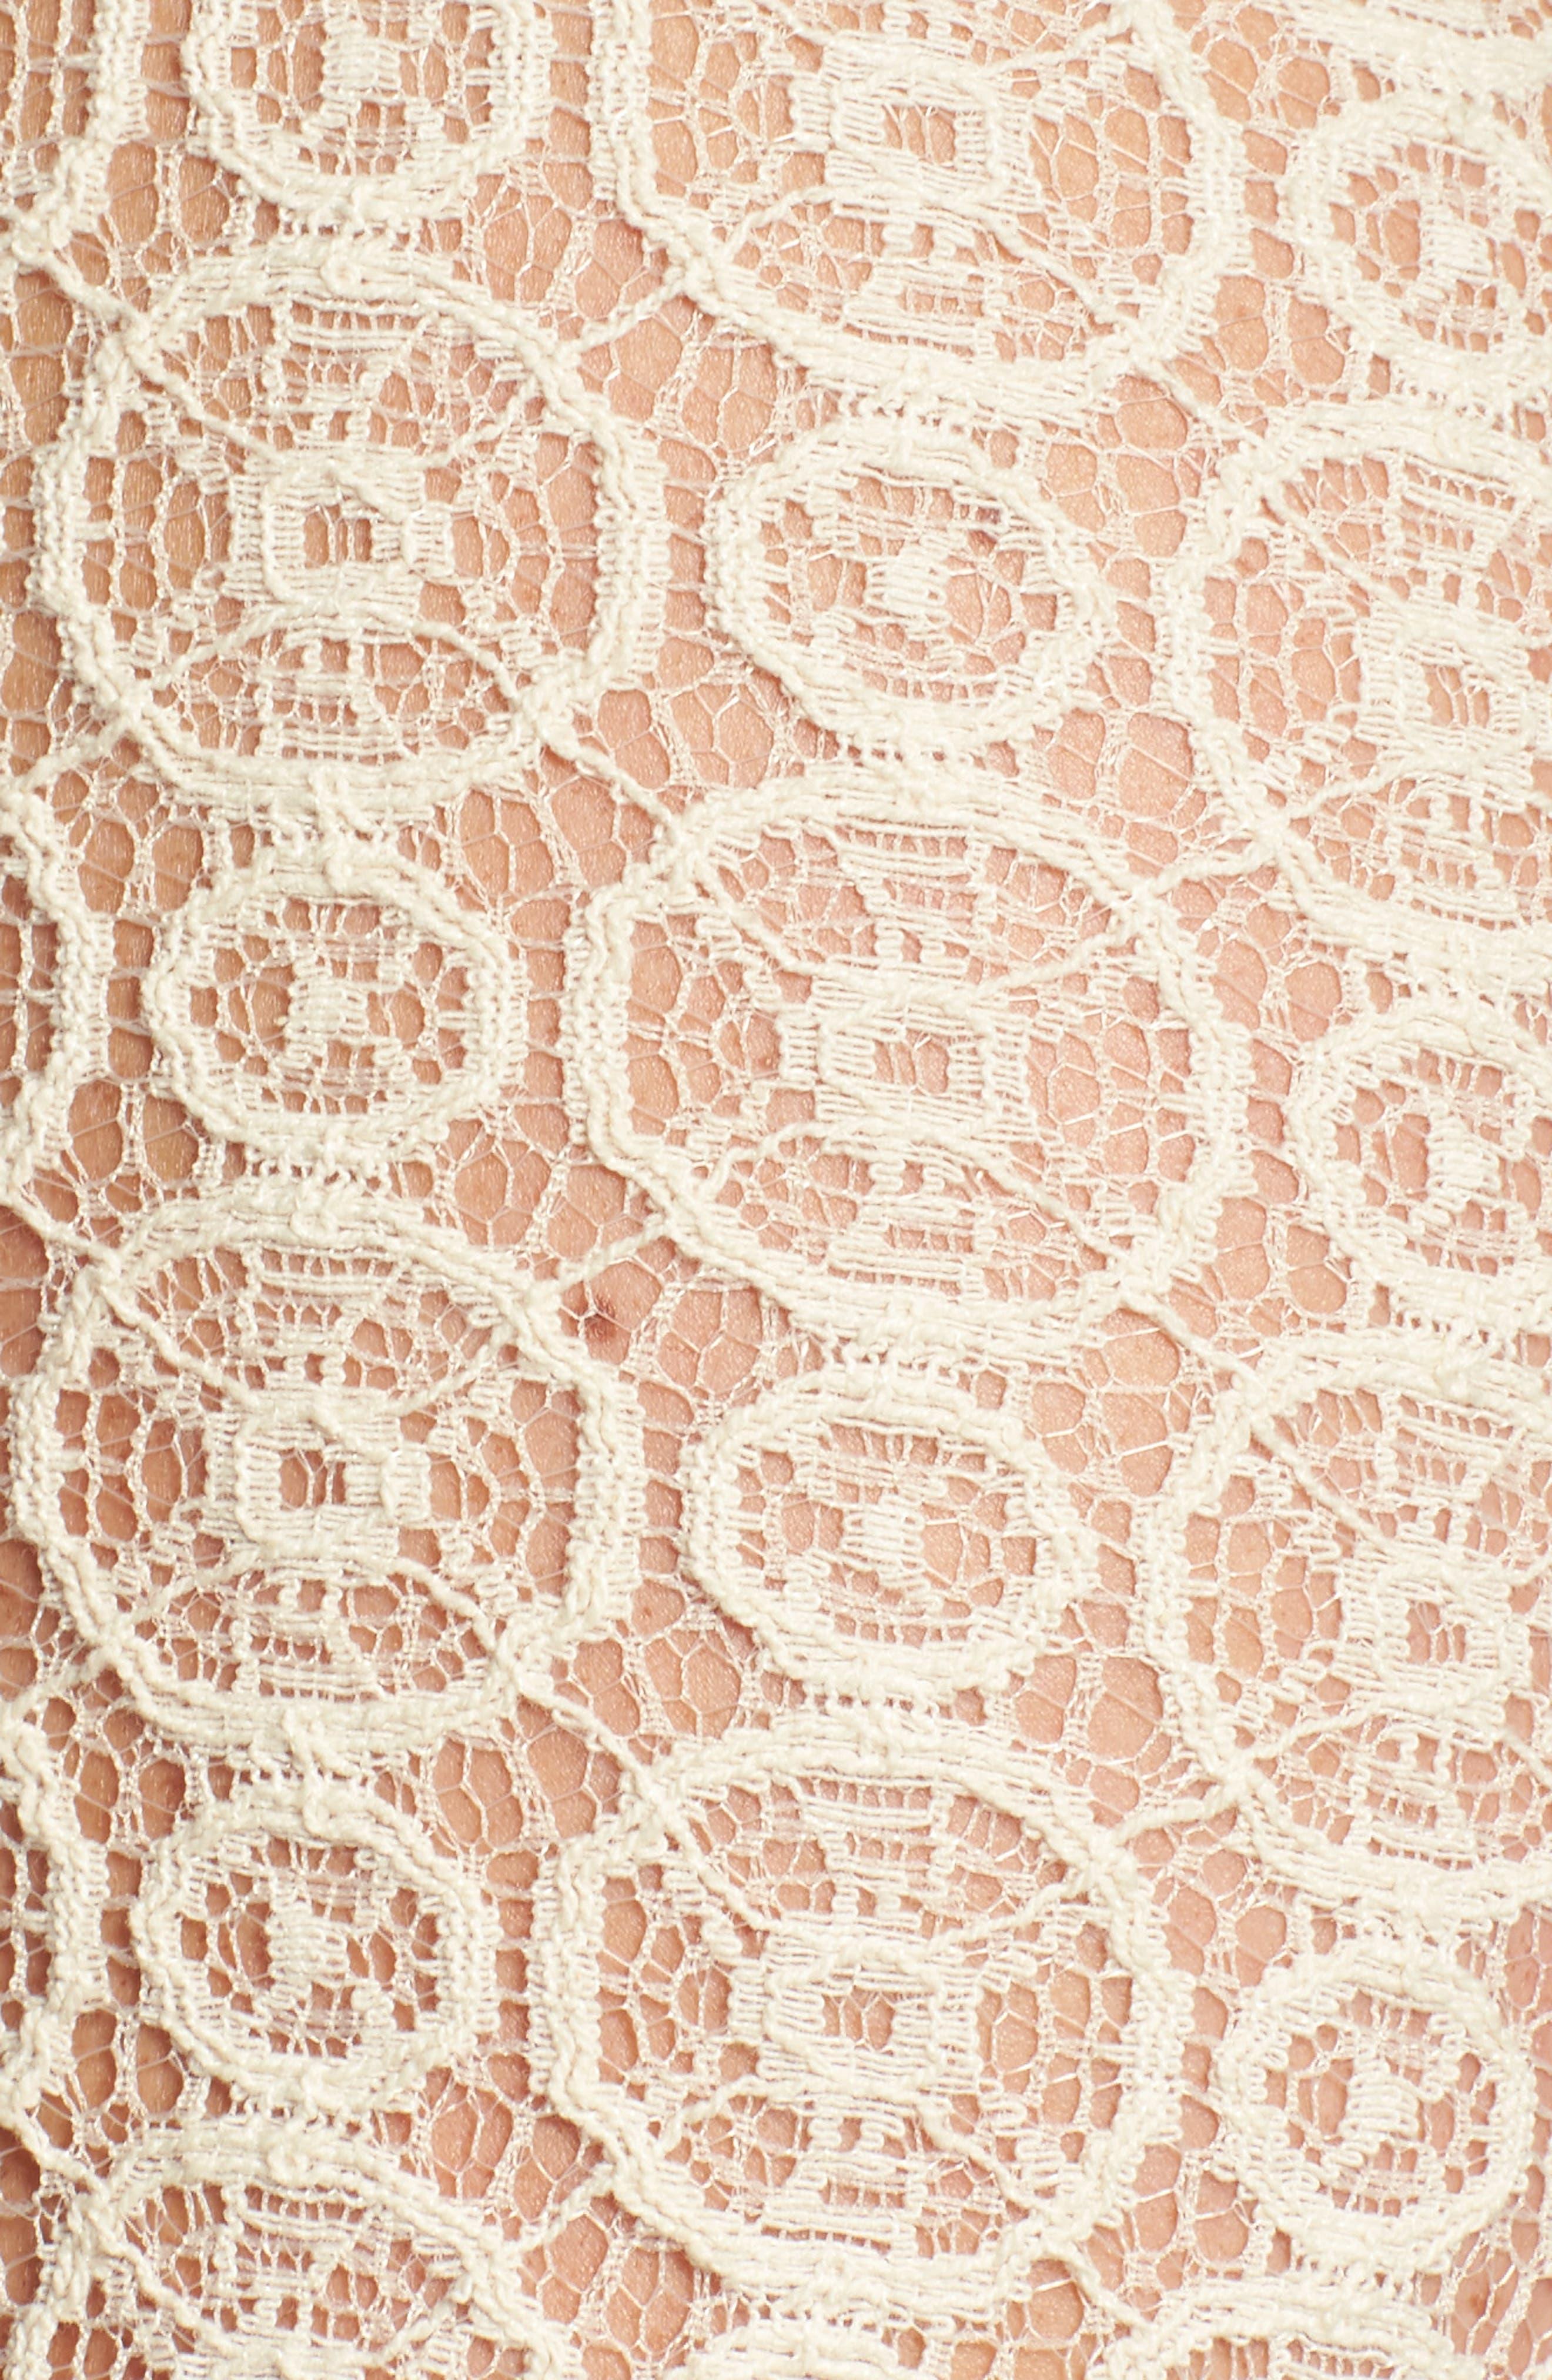 Fringe Trim Lace Top,                             Alternate thumbnail 5, color,                             Cream